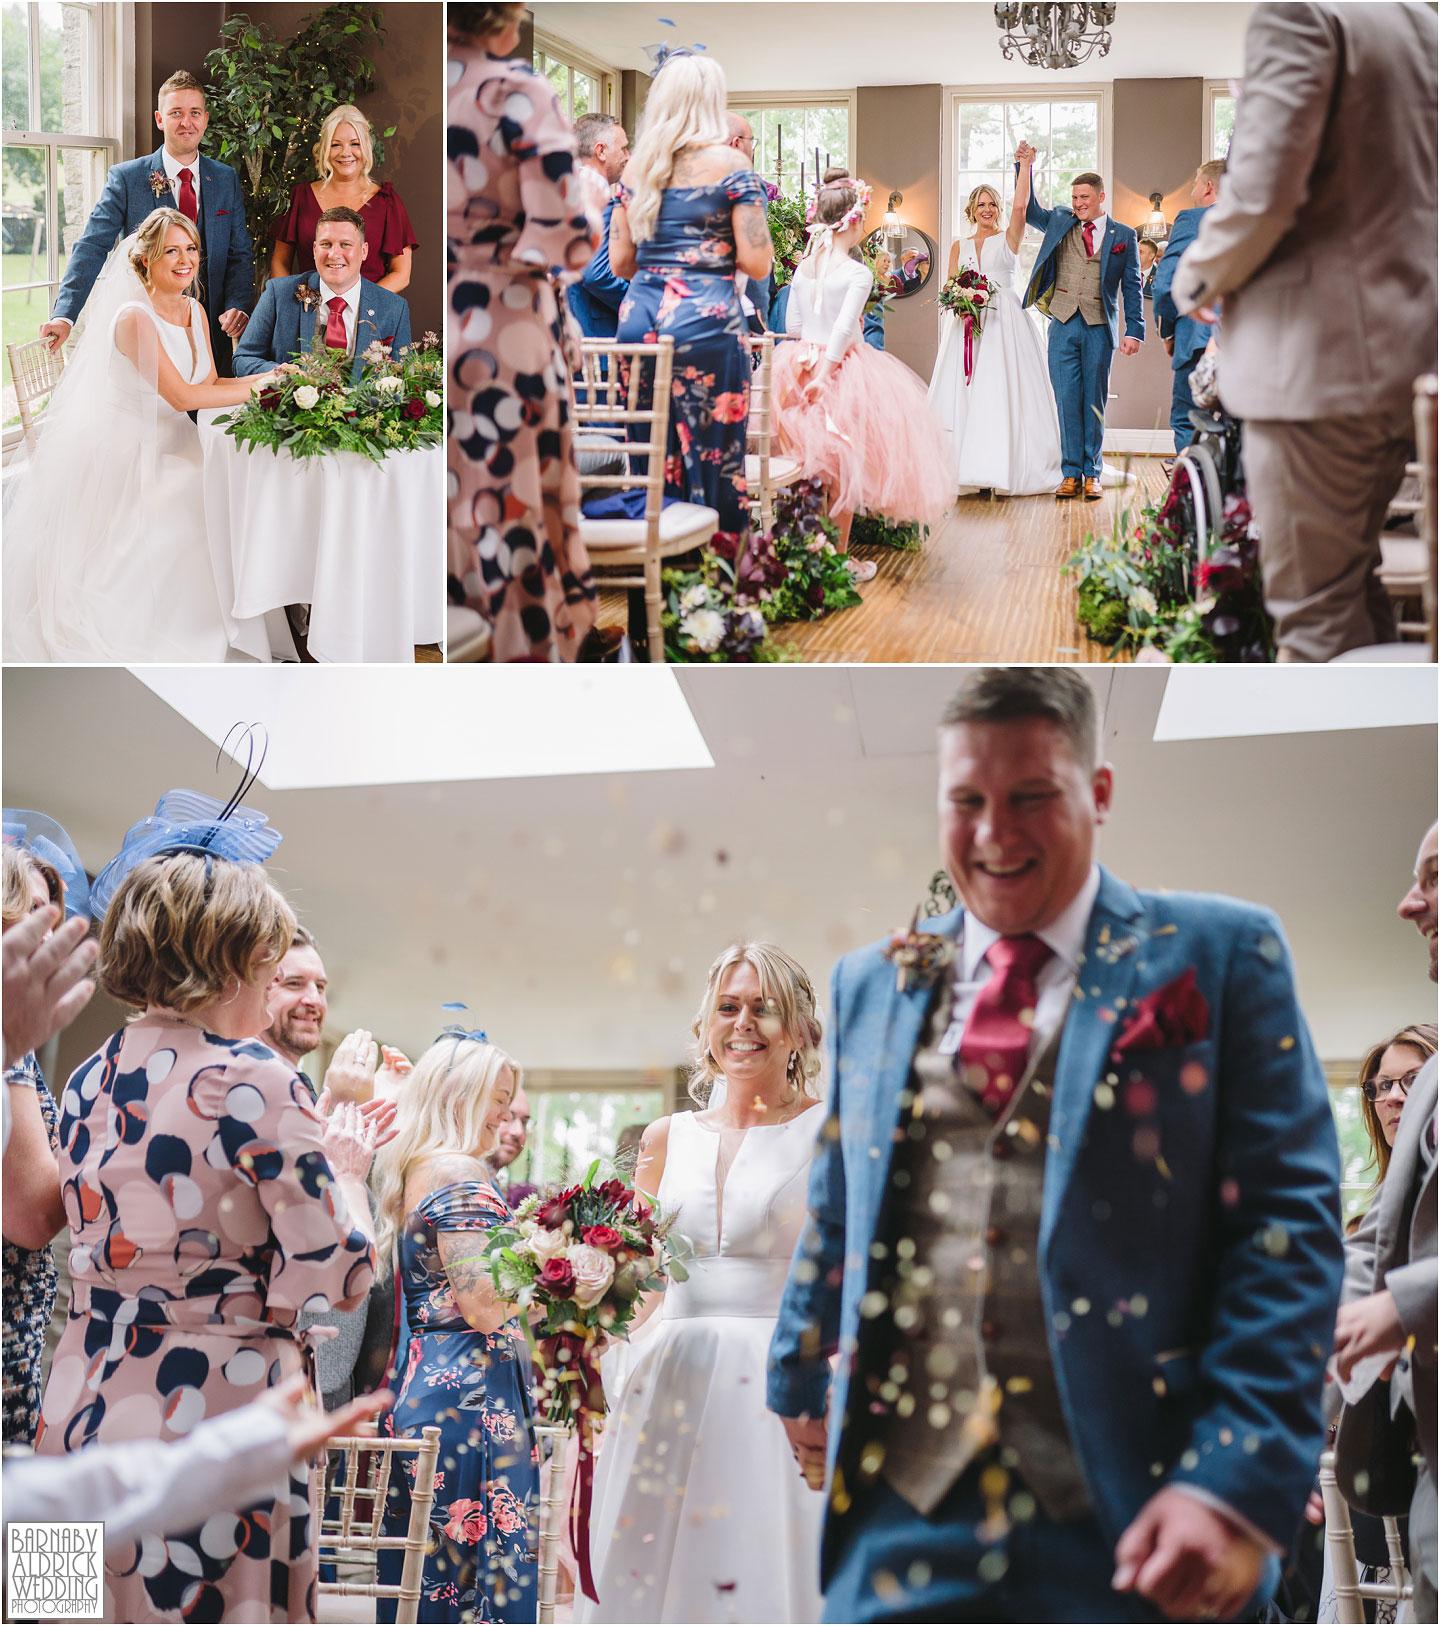 Civil ceremony in Yorebridge house, Bainbridge wedding venue, Civil ceremony venues Yorkshire dales, Boutique hotel wedding venue Yorkshire